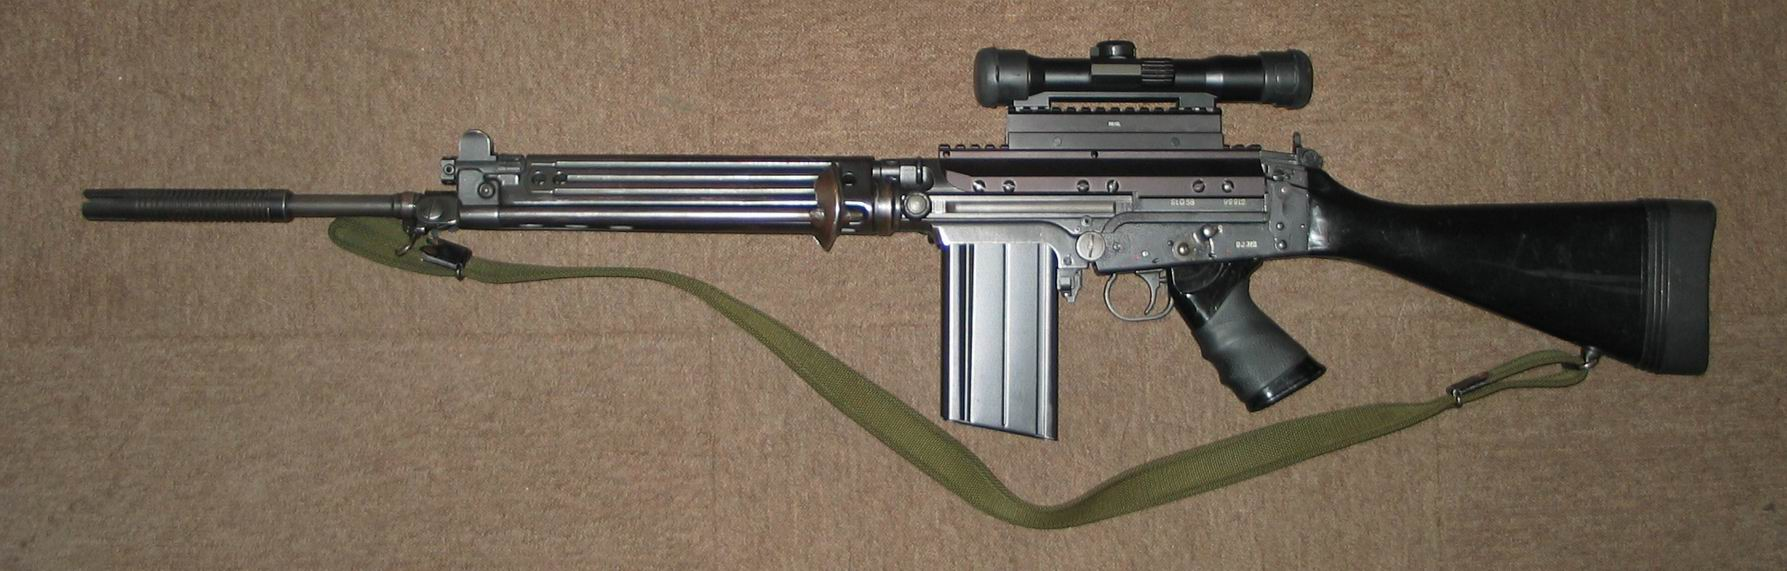 G3 arme